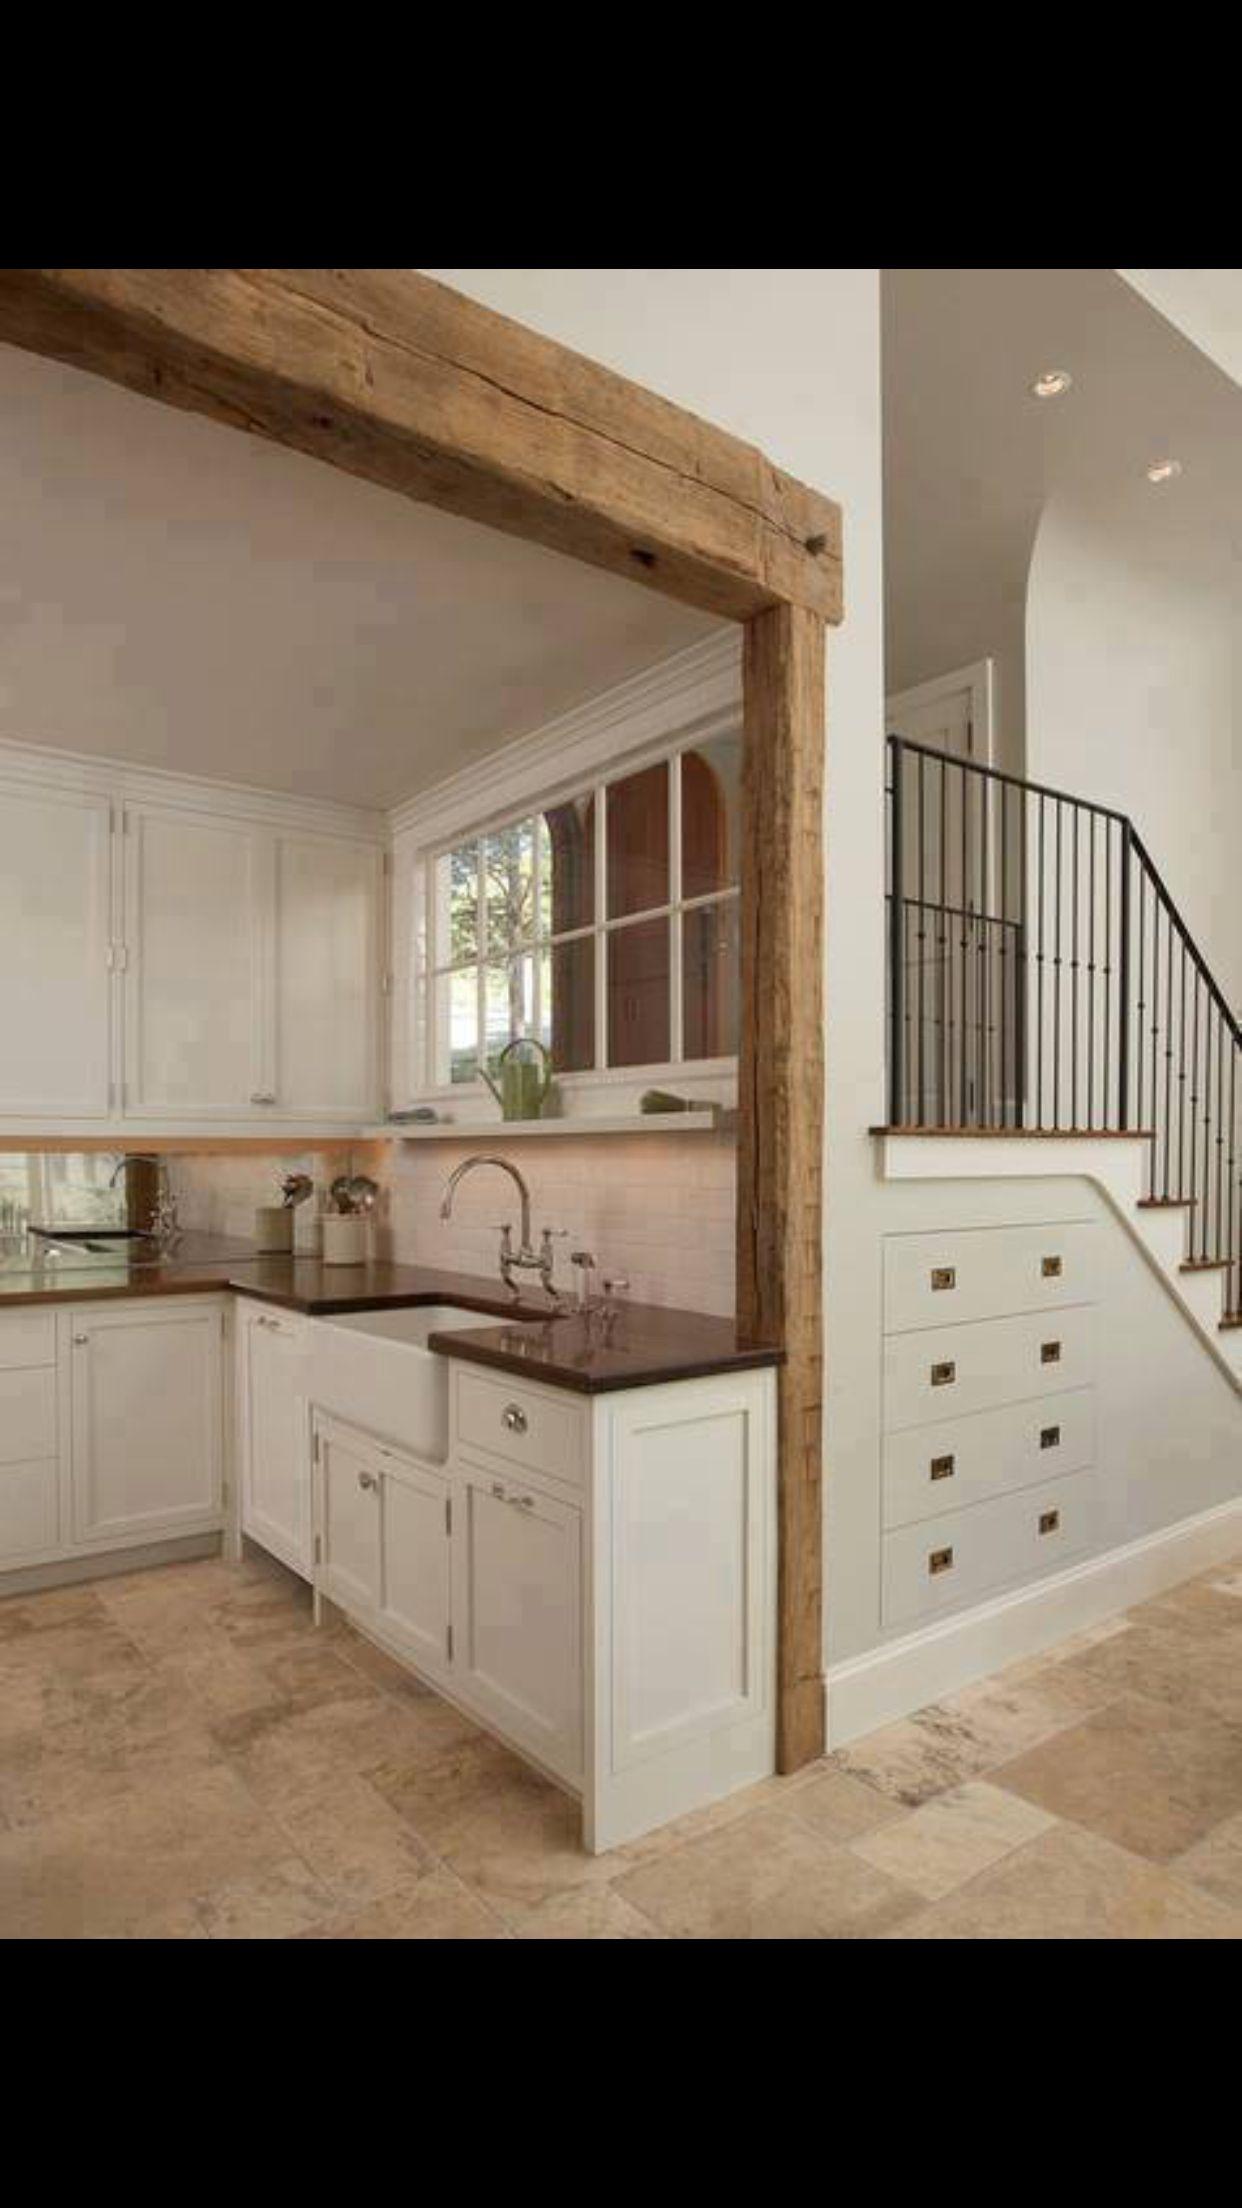 Pin By Natasa Kitsiou On House Ideas Mediterranean Kitchen Design Space Saving Kitchen Shaker Style Cabinets